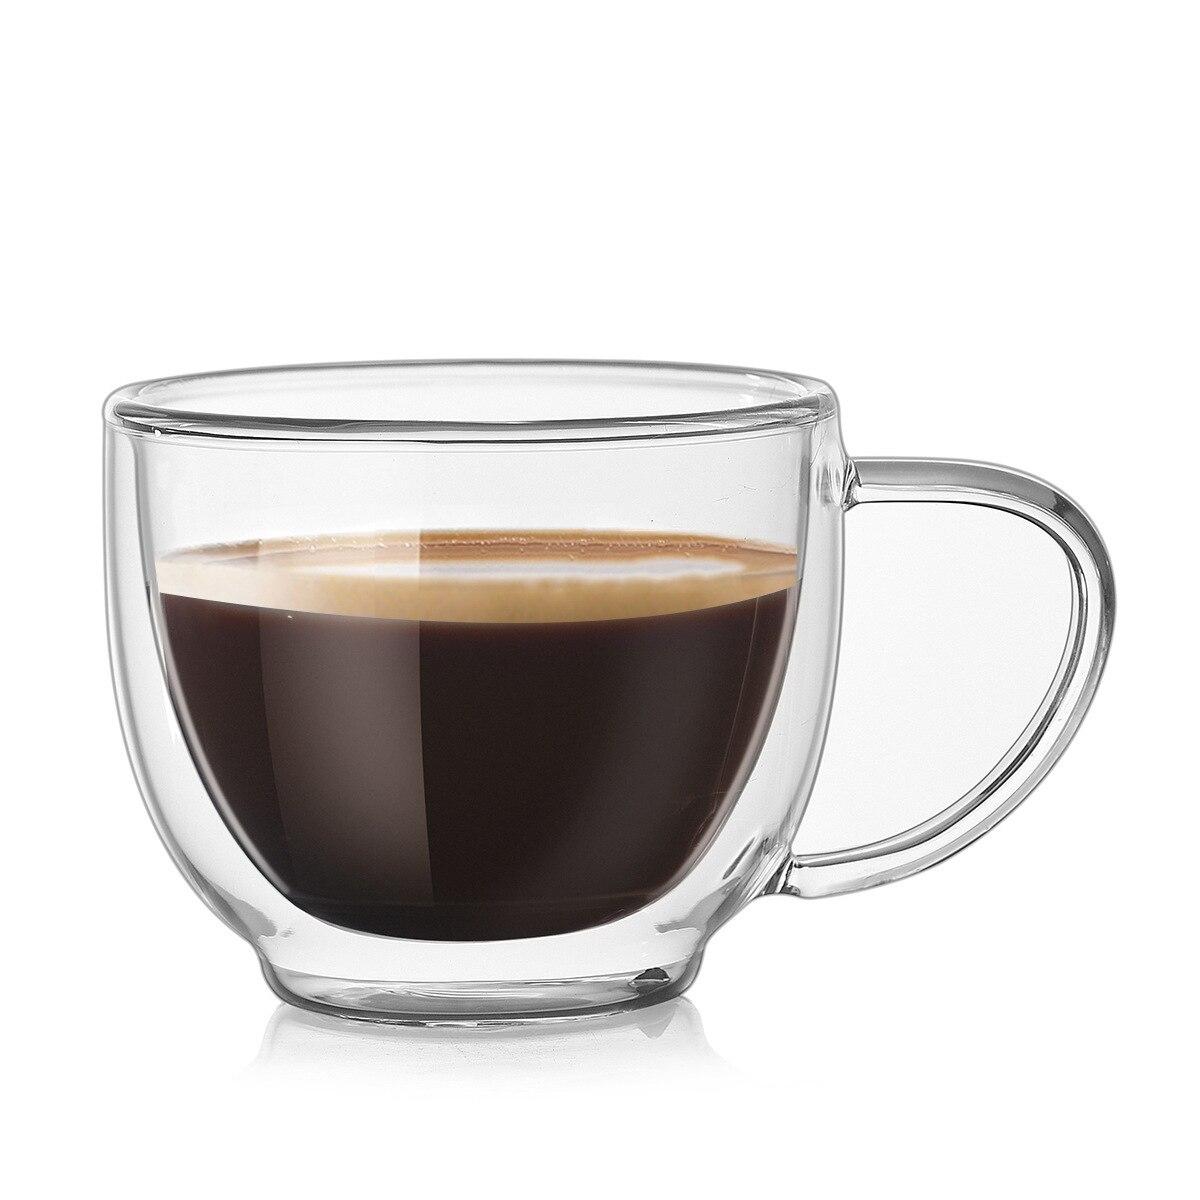 Glassware & Drinkware Double Wall Glass Coffee Cups Espresso Tea Latte Cappuccino Insulated Mugs 200ml Home, Furniture & DIY